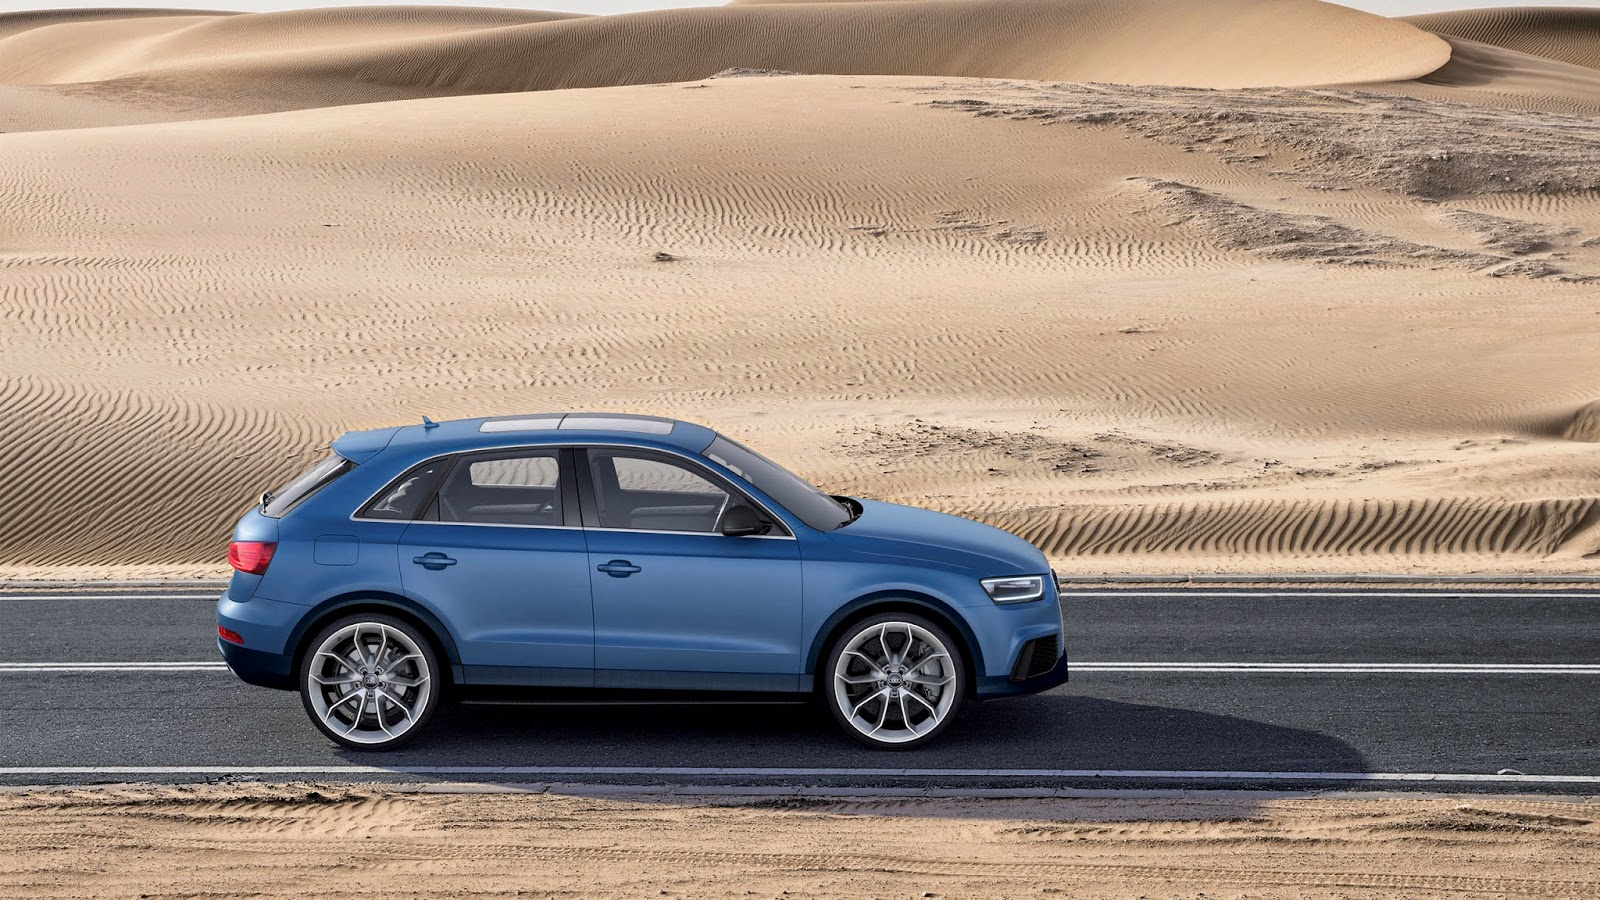 Wallpaper Mobil Mewah Audi Quattro